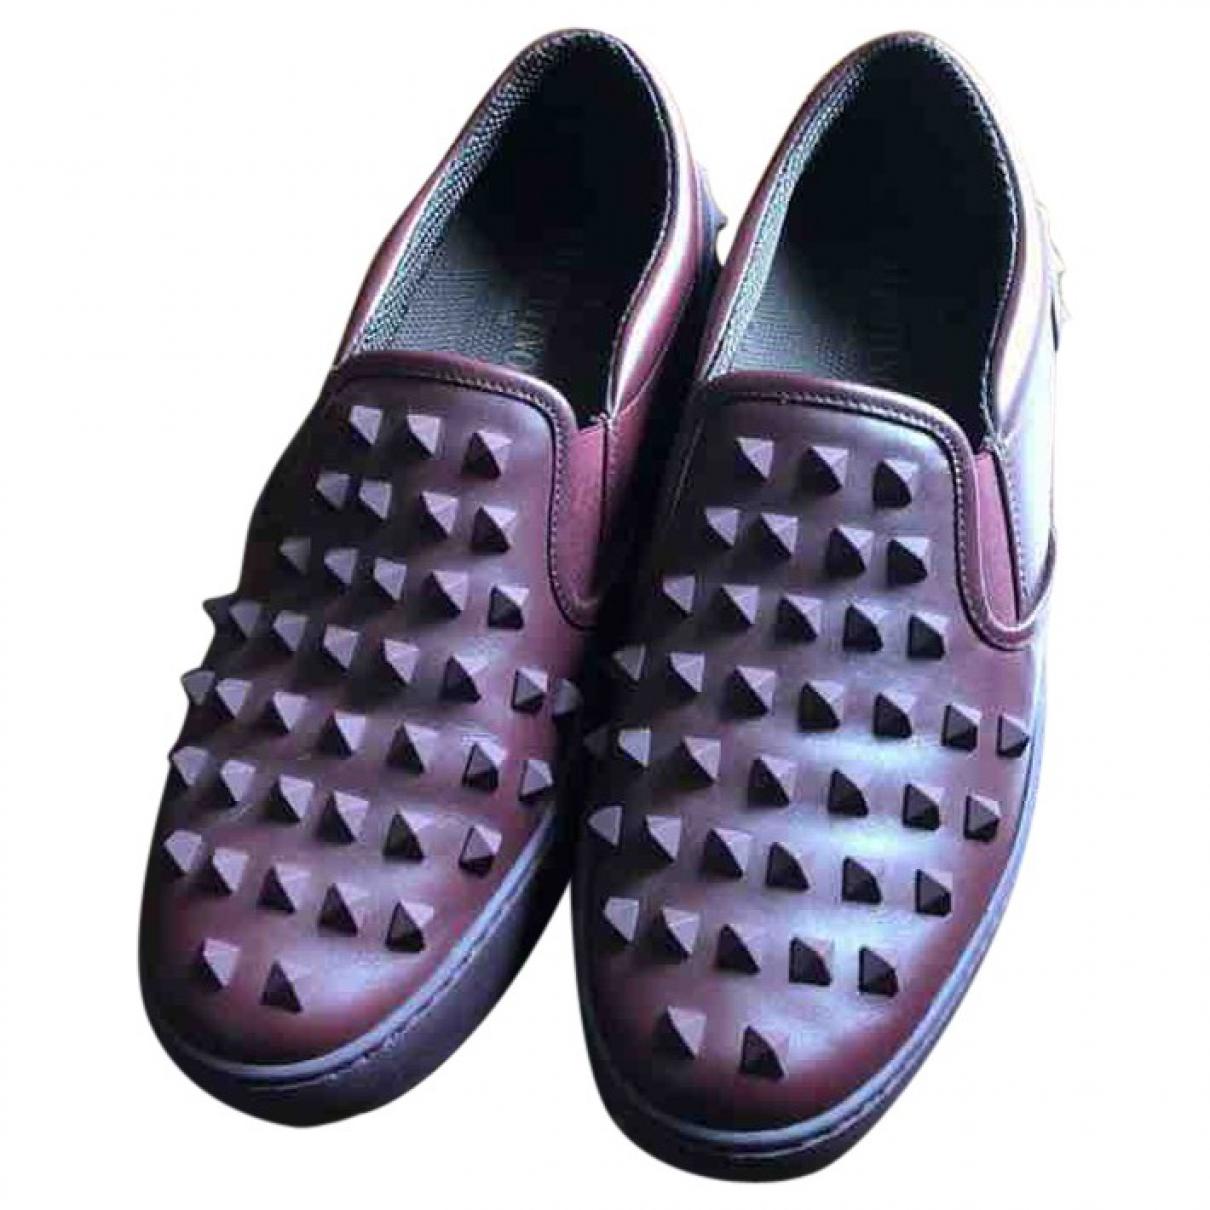 Valentino Garavani \N Burgundy Leather Trainers for Women 38 EU